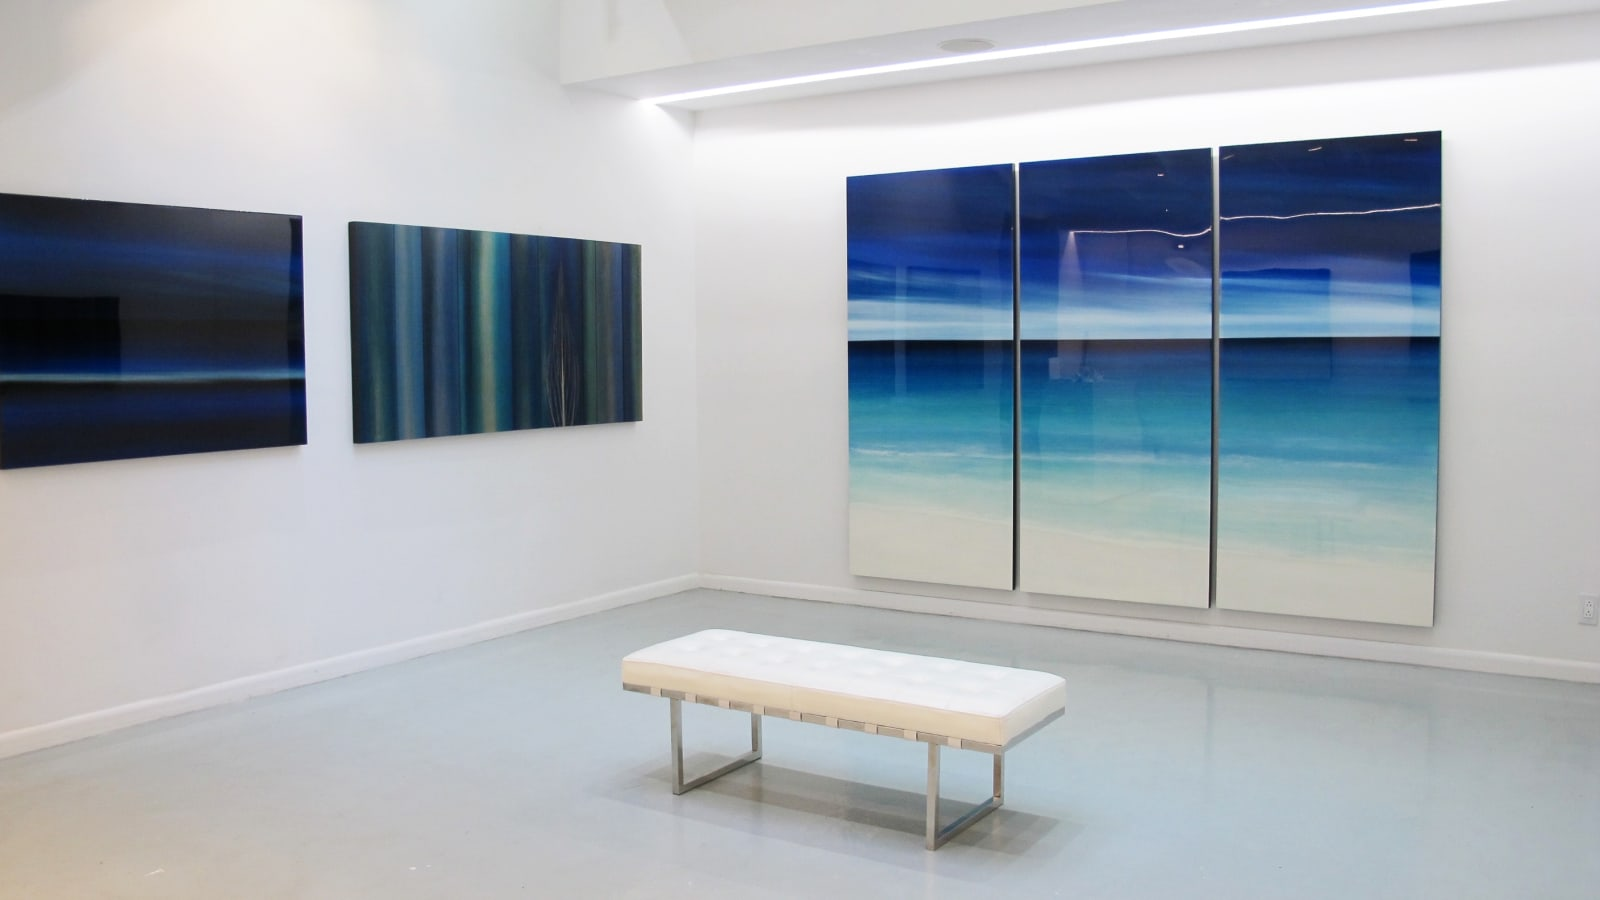 Hamilton Aguiar - On the Horizon